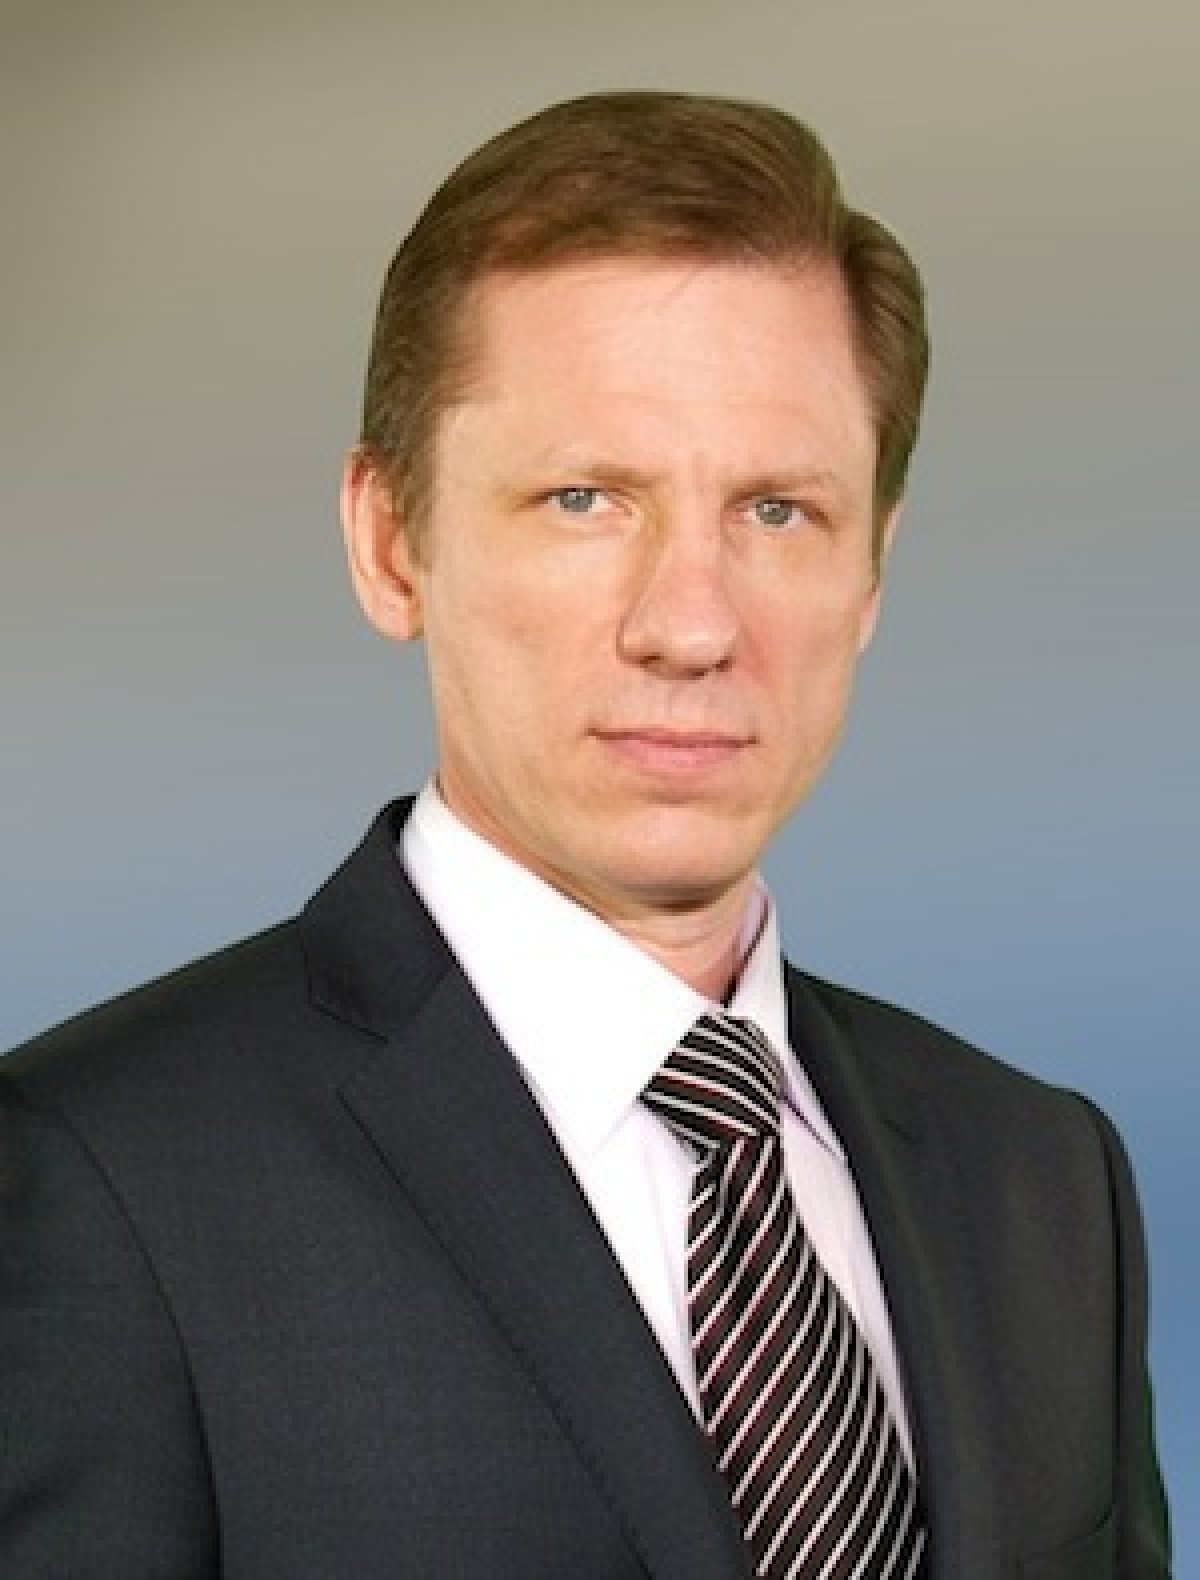 Временно исполняющим обязанности ректора РГАТУ имени П. А. Соловьёва назначен доктор физико-математических наук